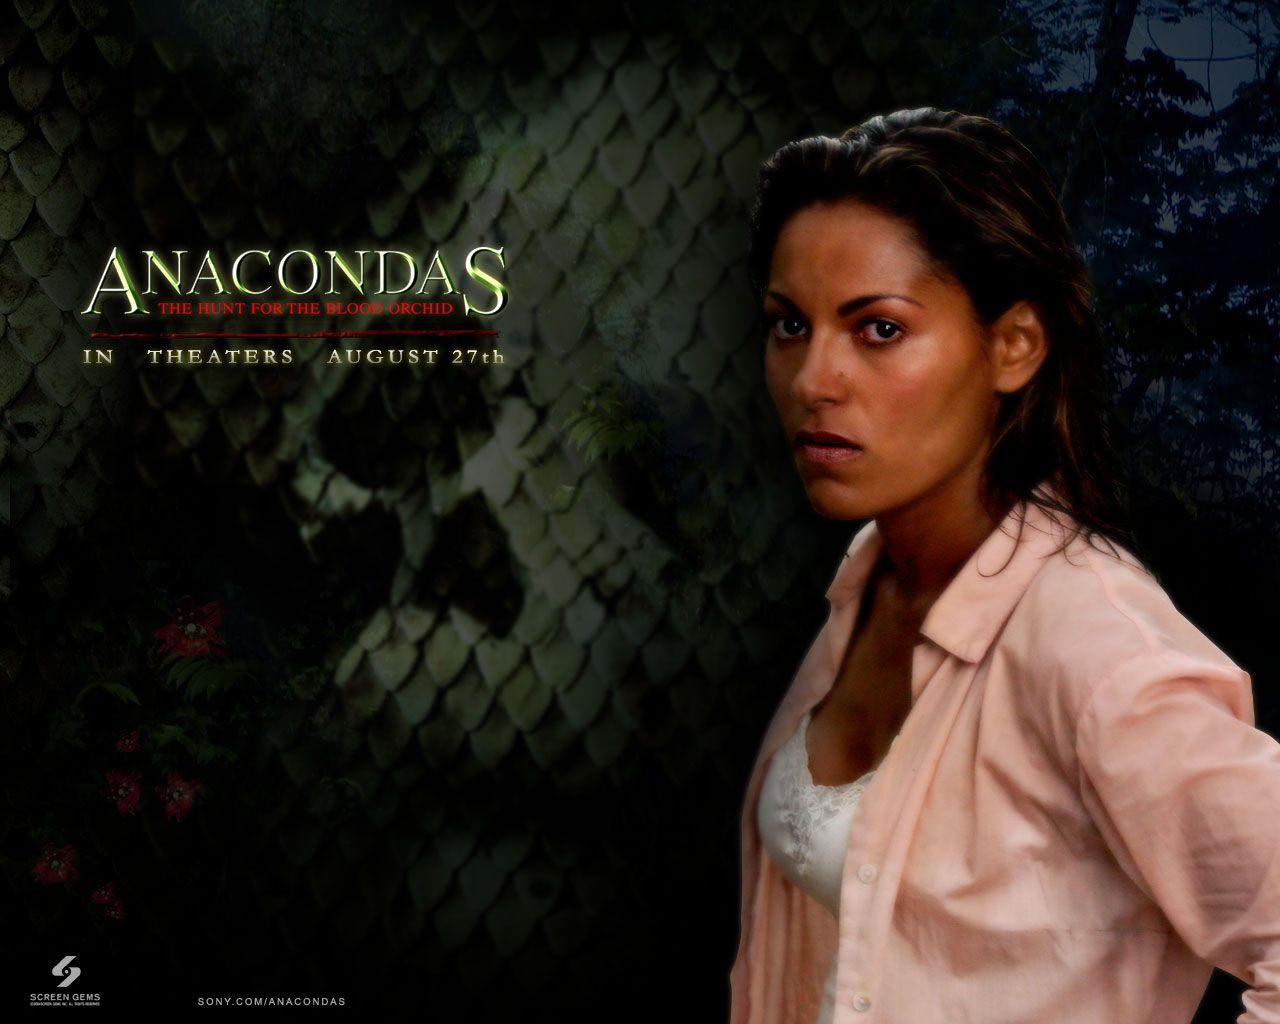 Watch Streaming Hd Anacondas Starring N A N A Documentary Http